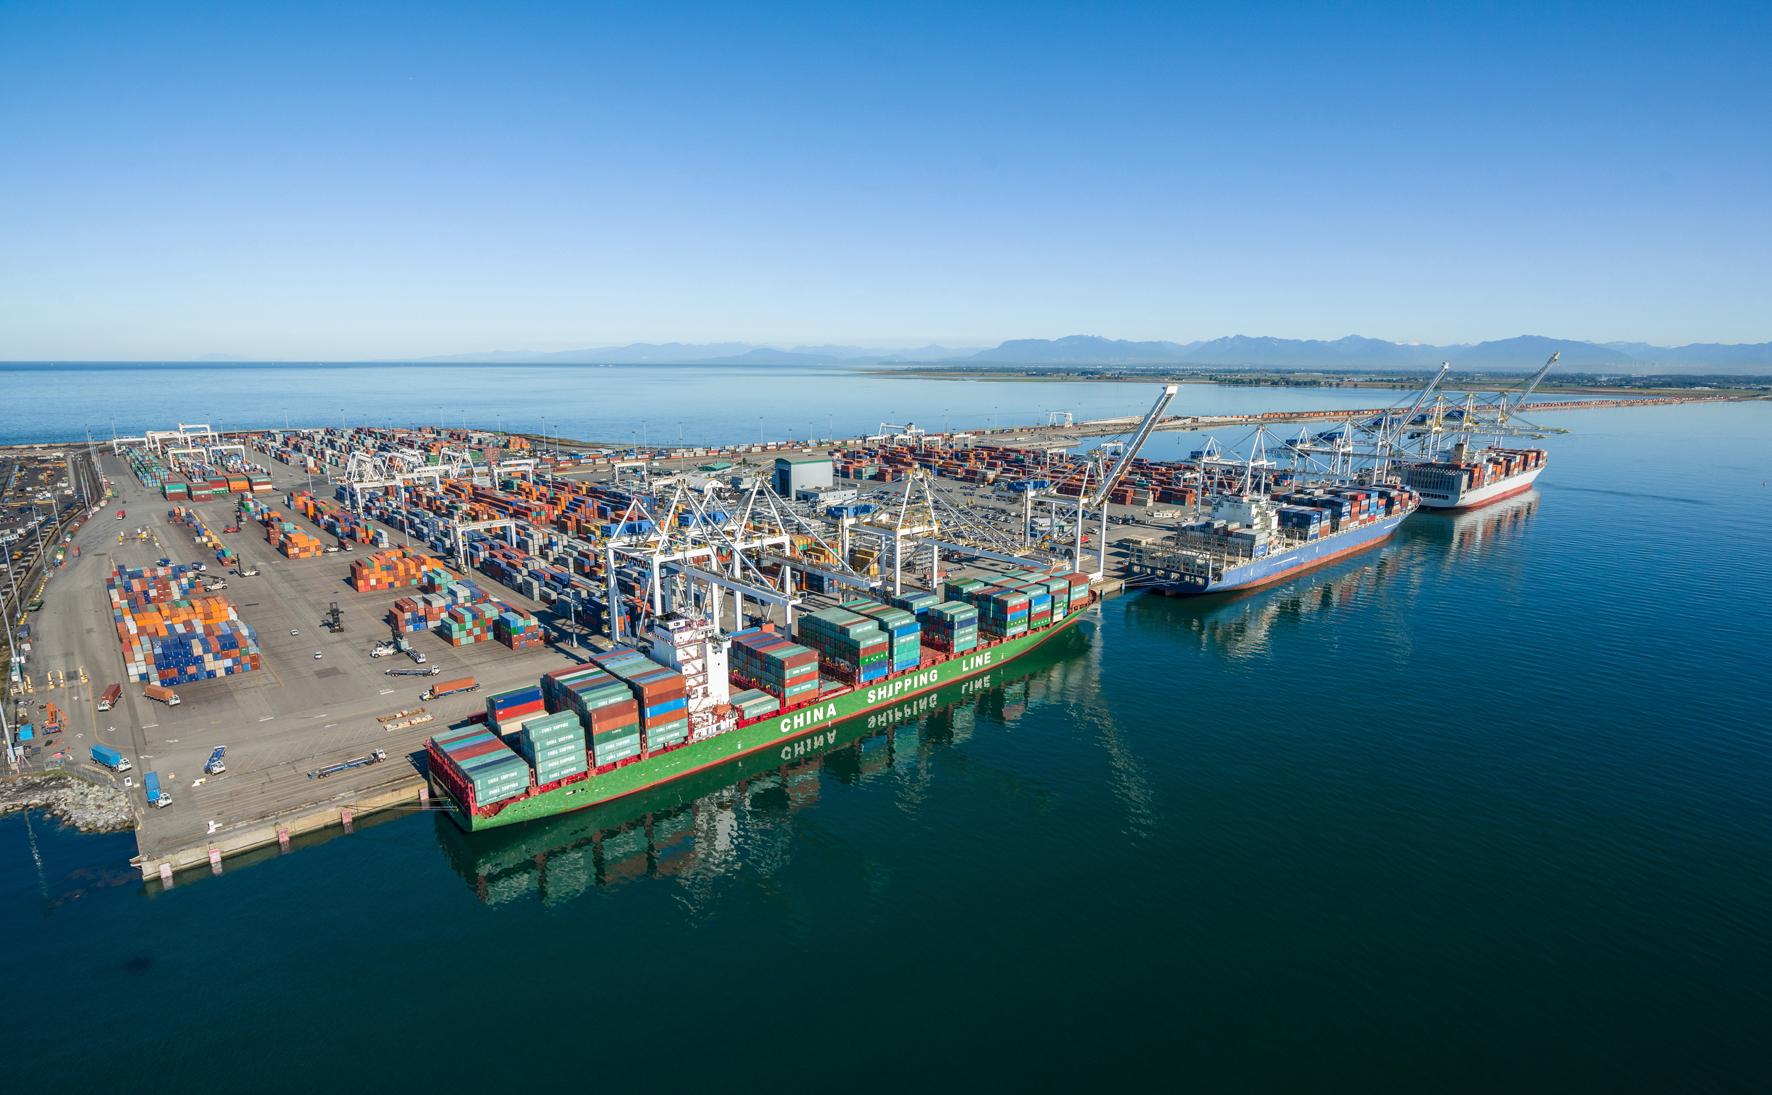 Overhead Cranes Vancouver Bc : Konecranes wins rtg order for gct deltaport in vancouver canada